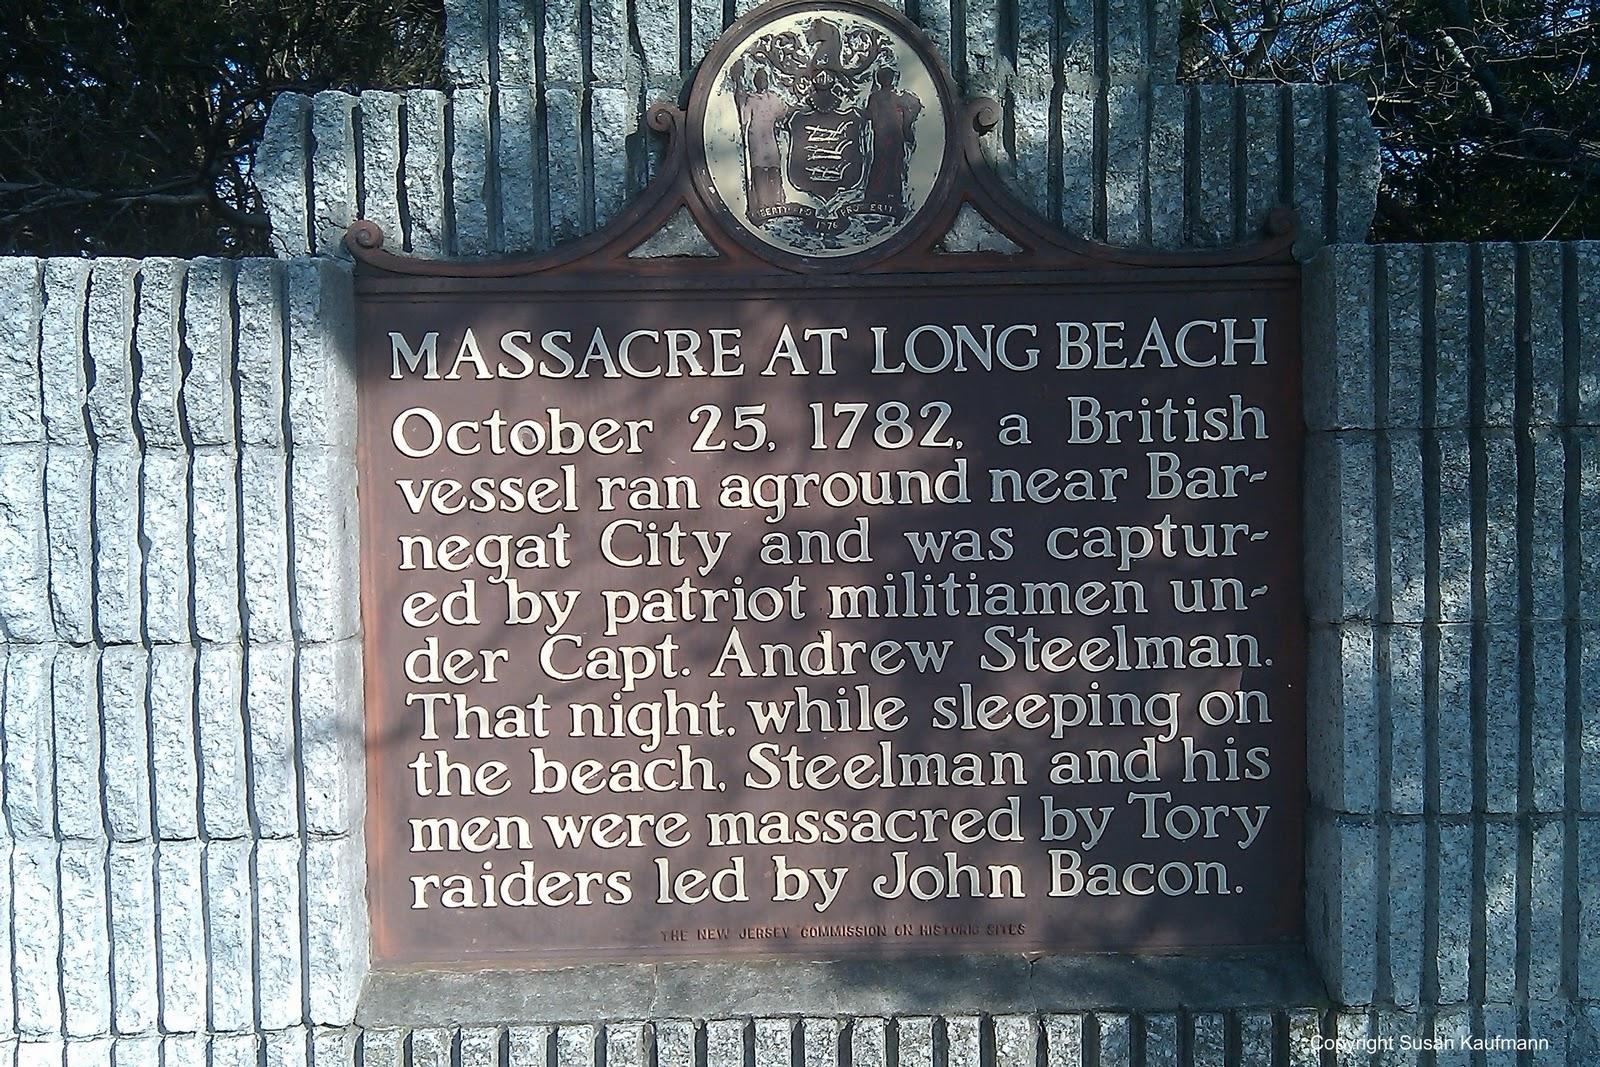 LBI historical marker